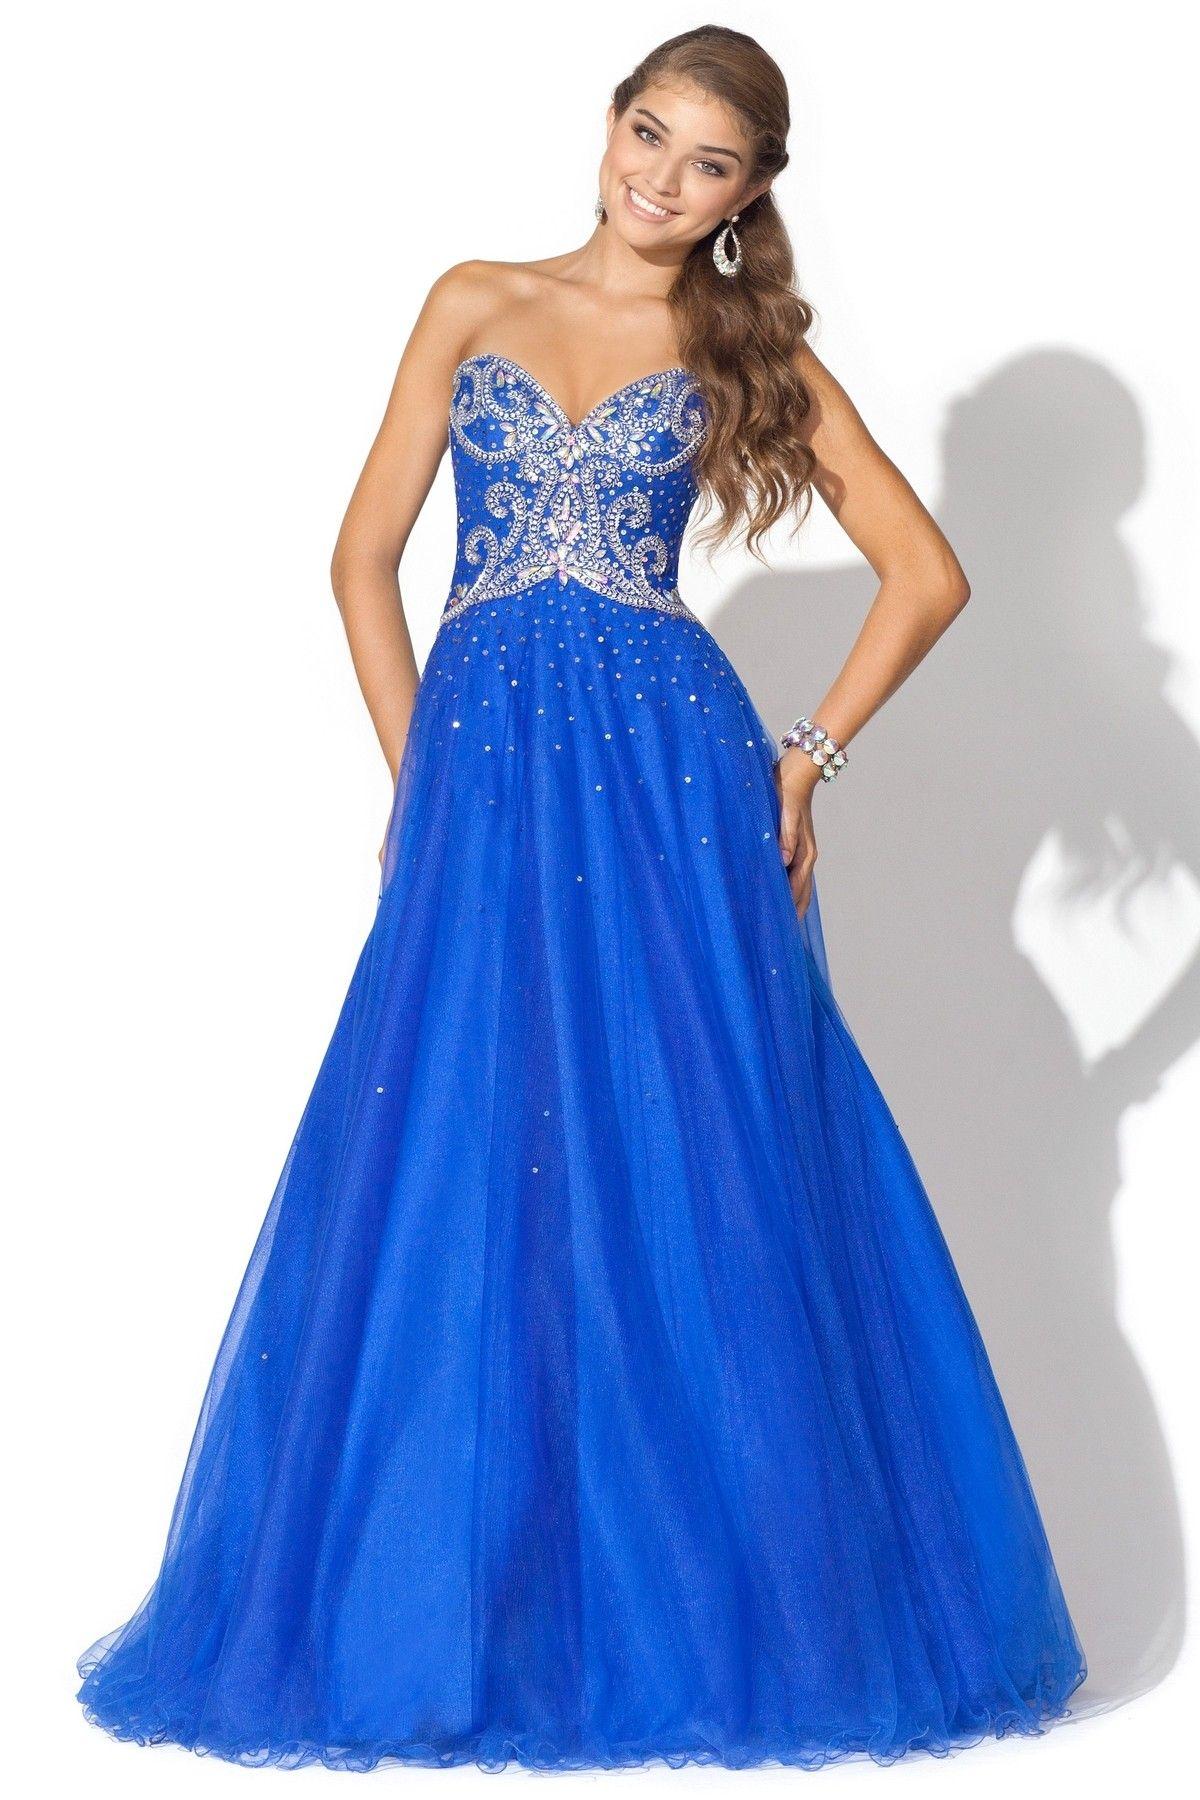 Long Puffy Prom Dresses 2013